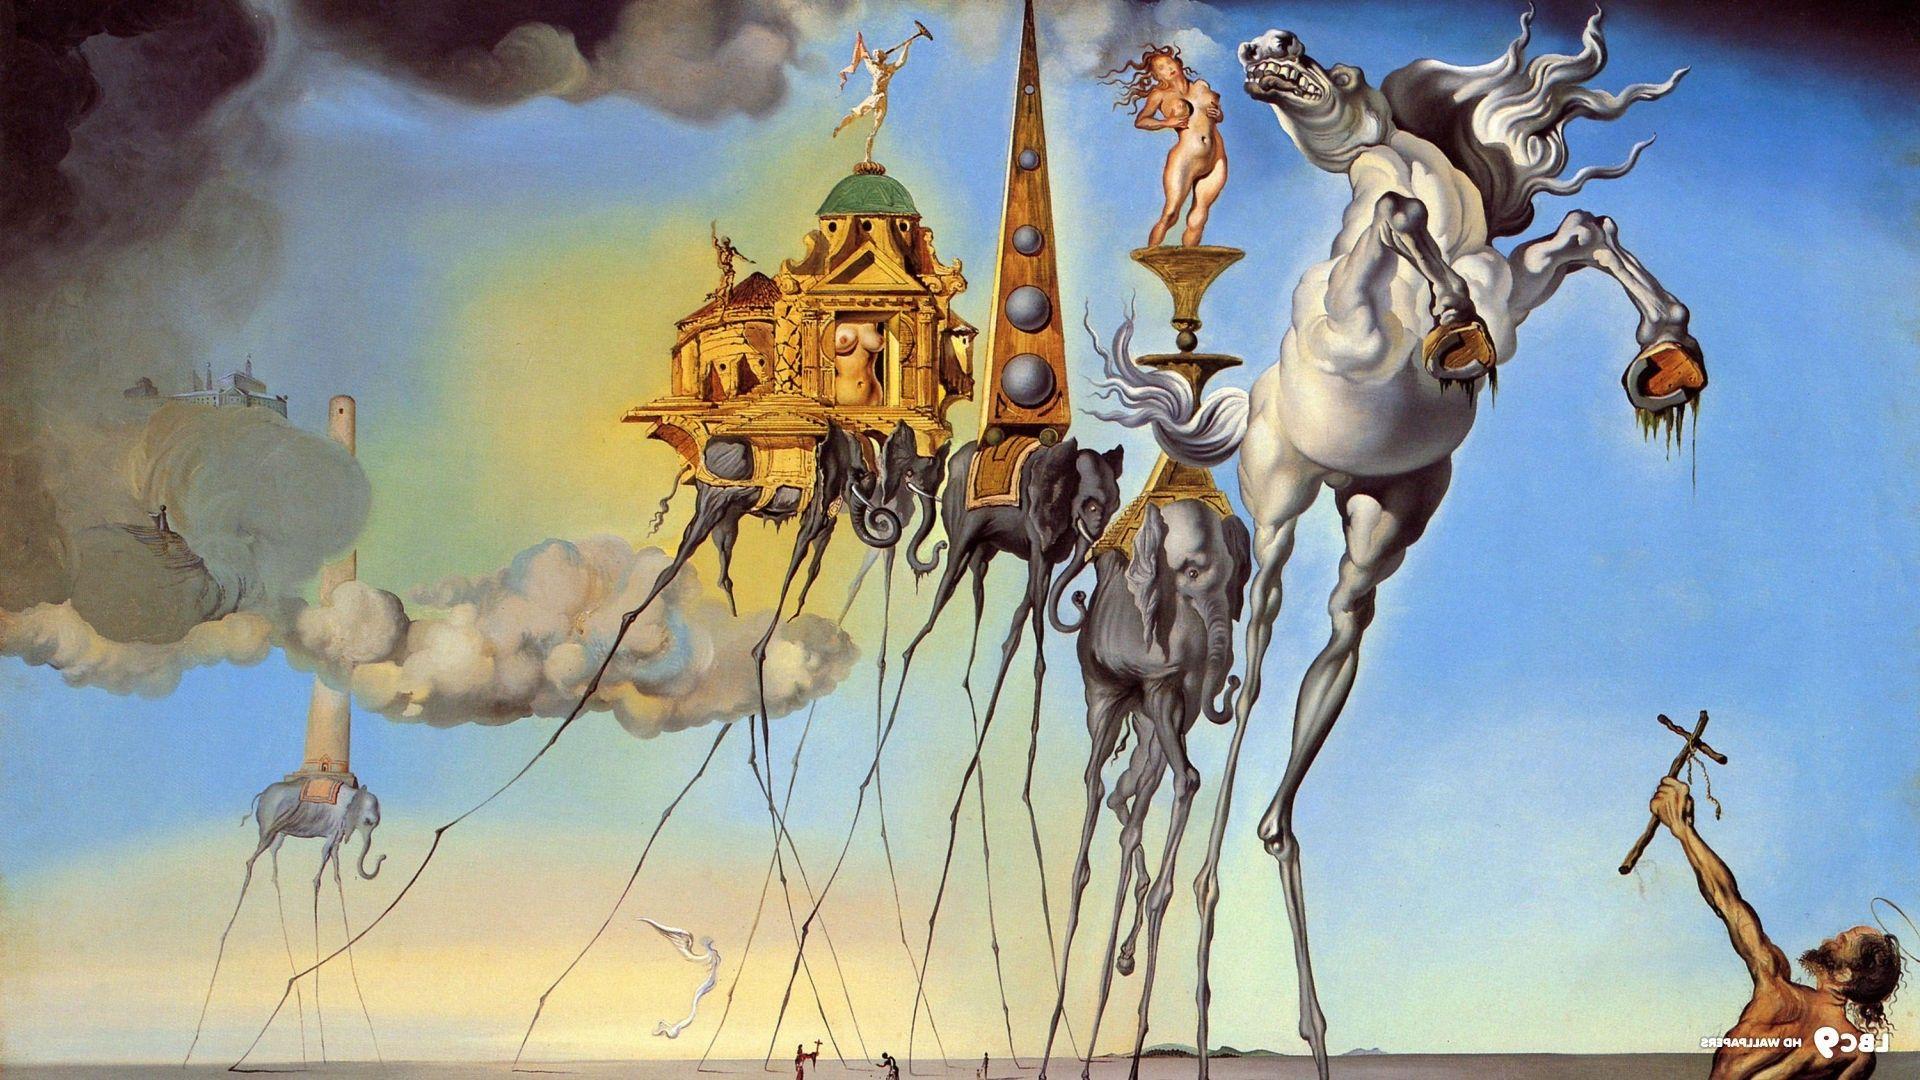 Salvador Dali Painting Fantasy Art Skull War Clocks Time Classic Art Wallpaper Salvador Dali Paintings Dali Paintings Mark Rothko Paintings